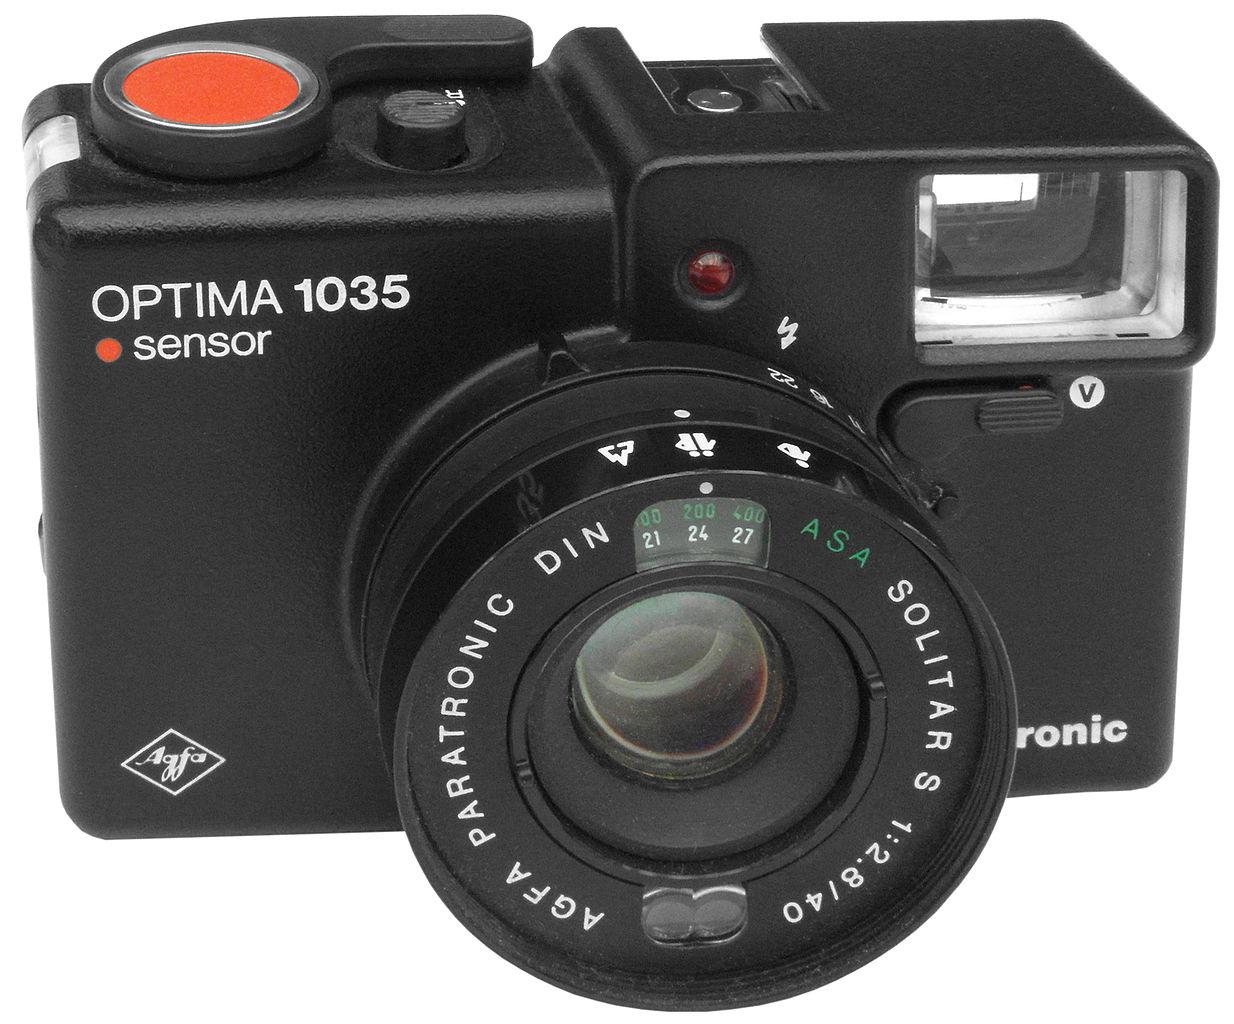 File:Agfa Optima 1035 Sensor electronic.jpg